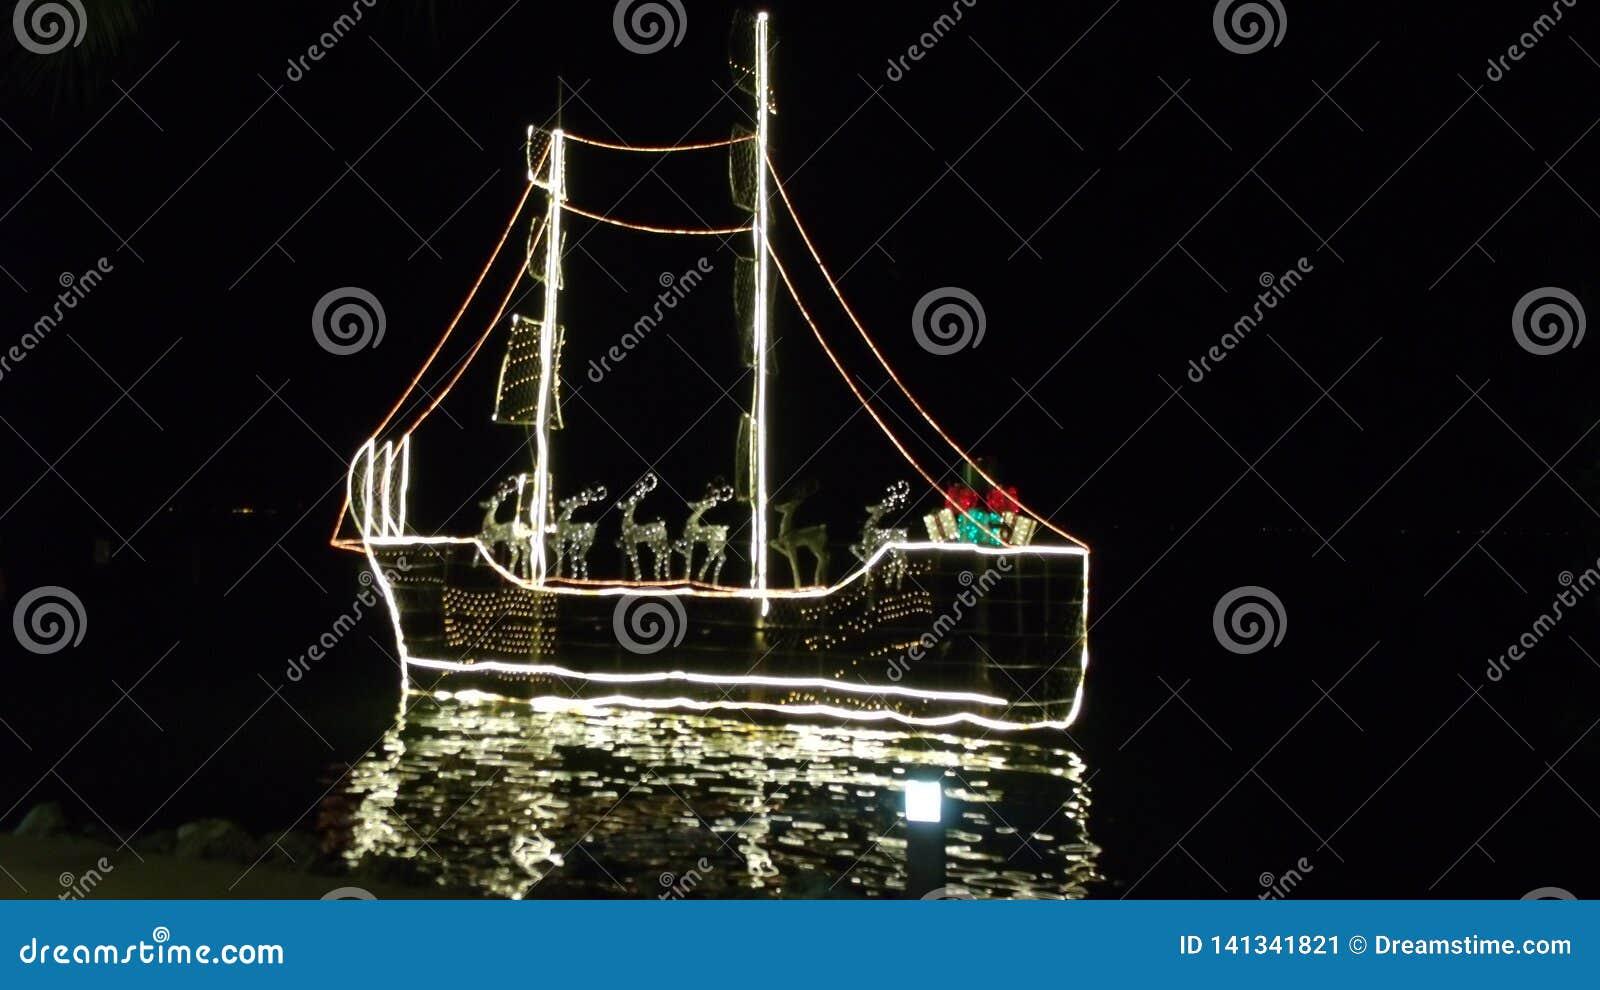 Christmas boat decorating beach